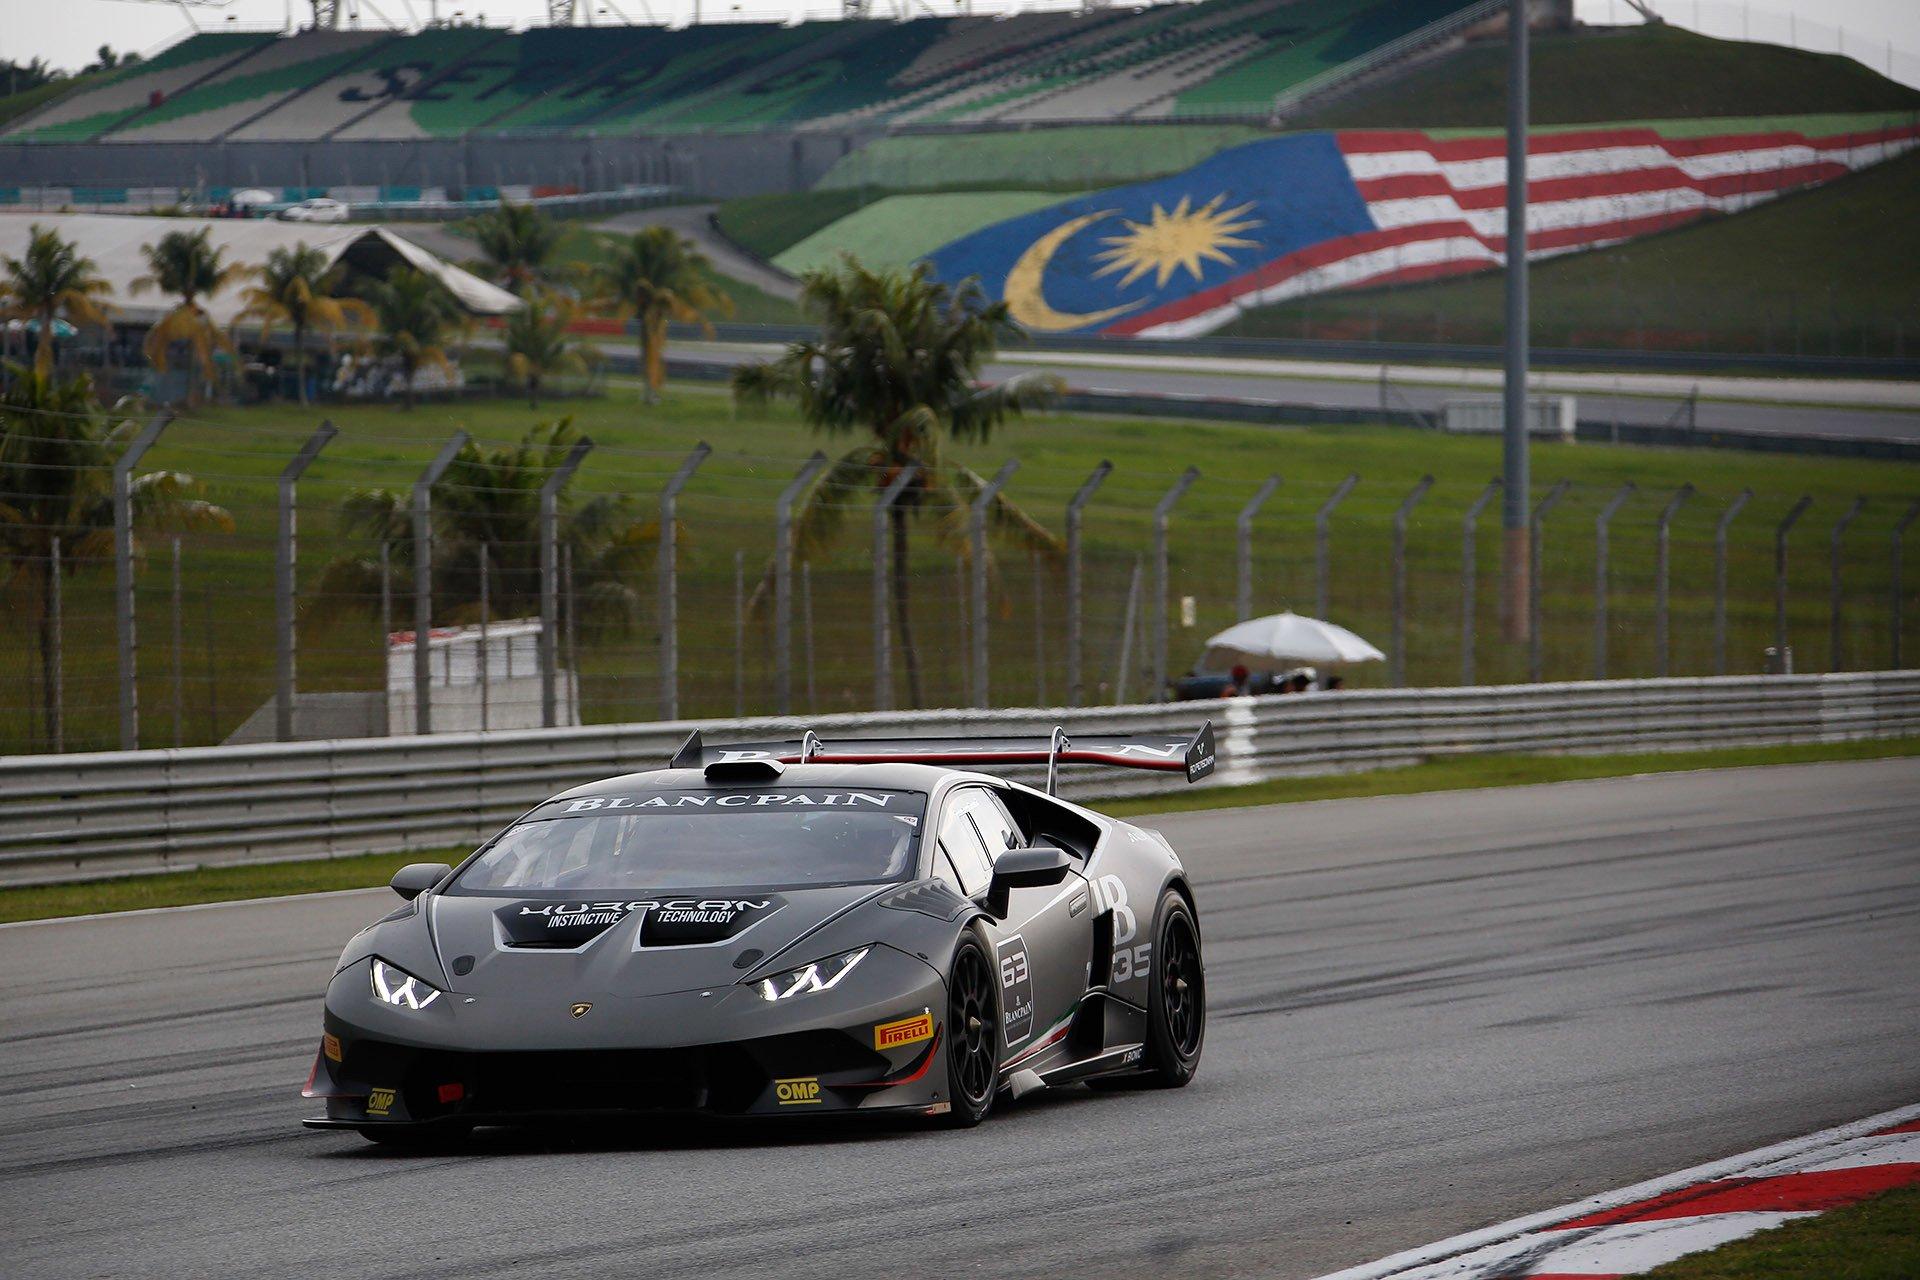 2015 lamborghini huracan lp 620 2 super trofeo cars racecars wallpaper 1920x1280 768412 wallpaperup